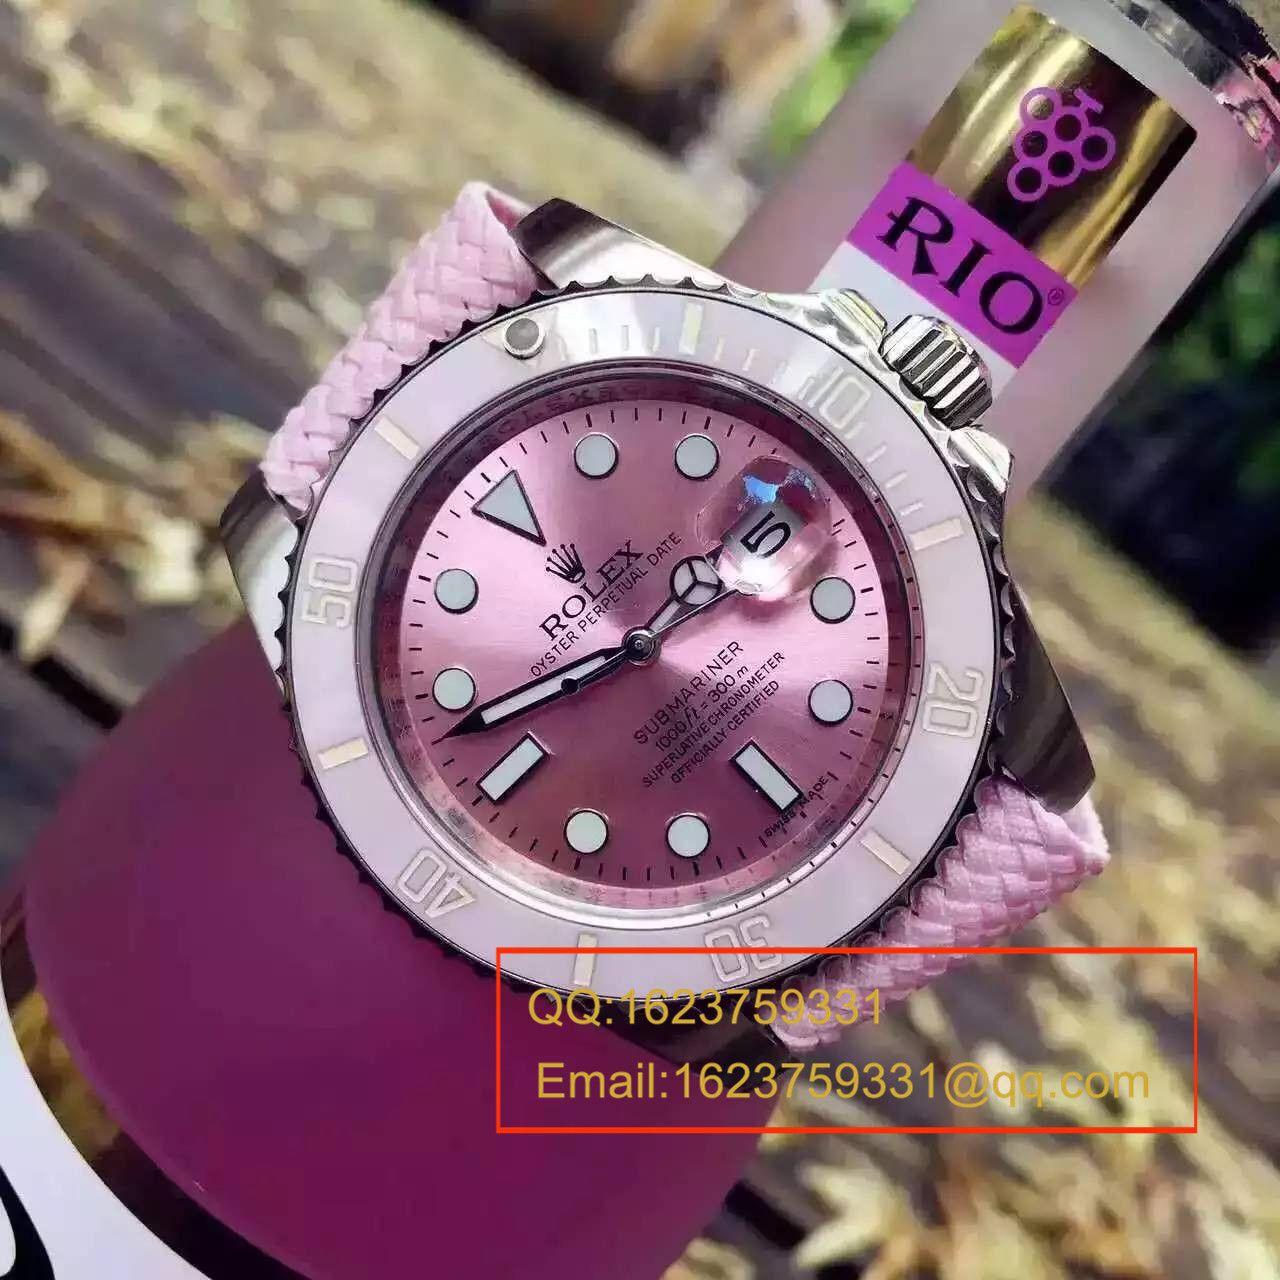 【NOOB厂1:1顶级复刻手表】劳力士潛航者型系列116610LN 银盘《SUB粉水鬼》女款腕表